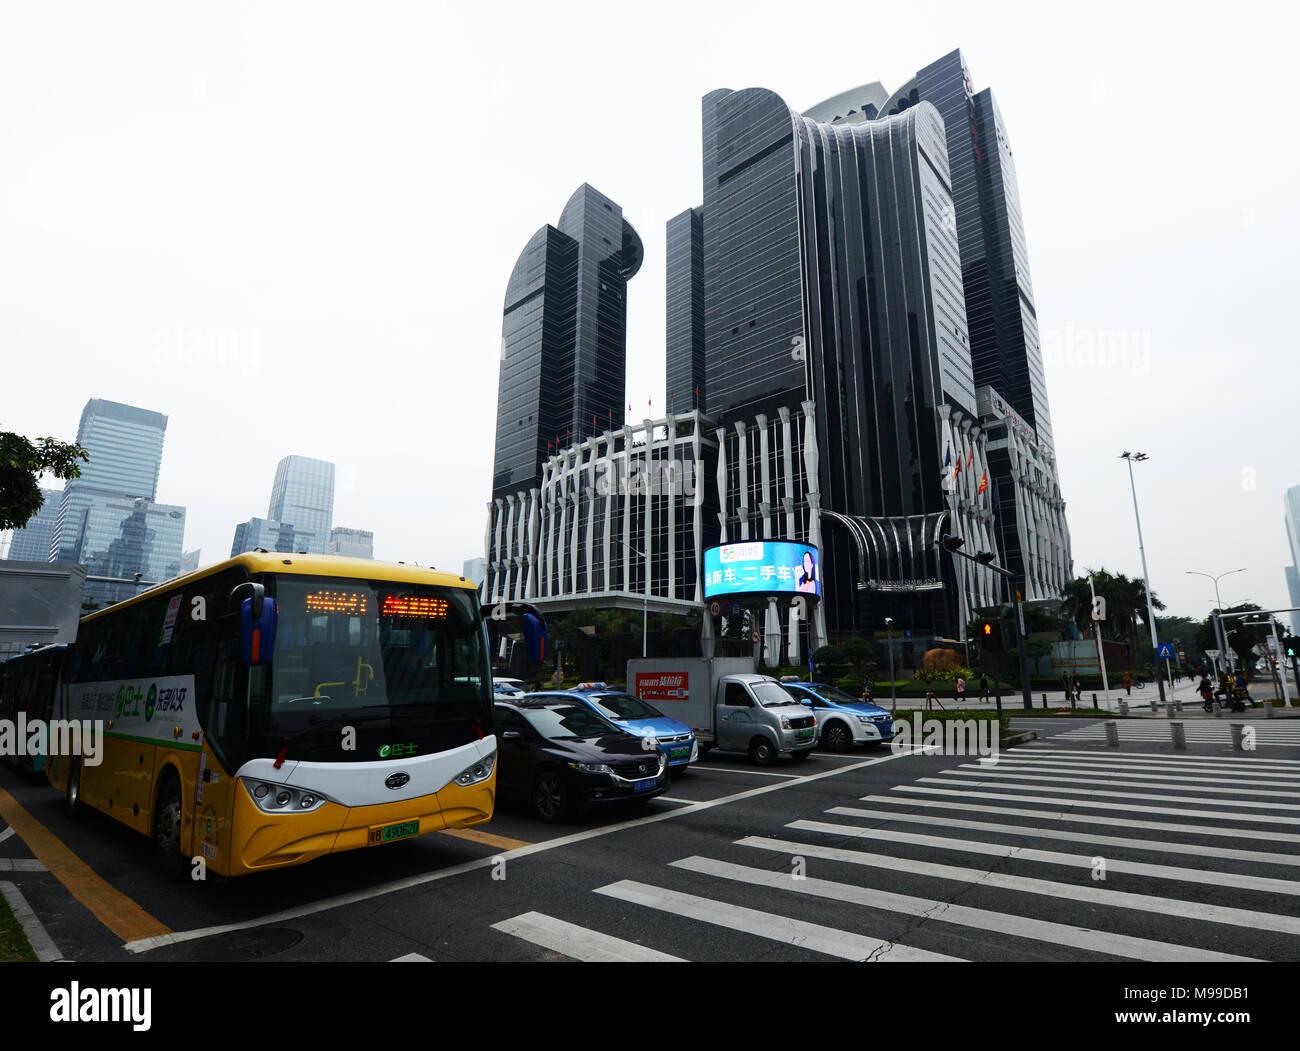 Modern skyscrapers dominate the Futian skyline. - Stock Image